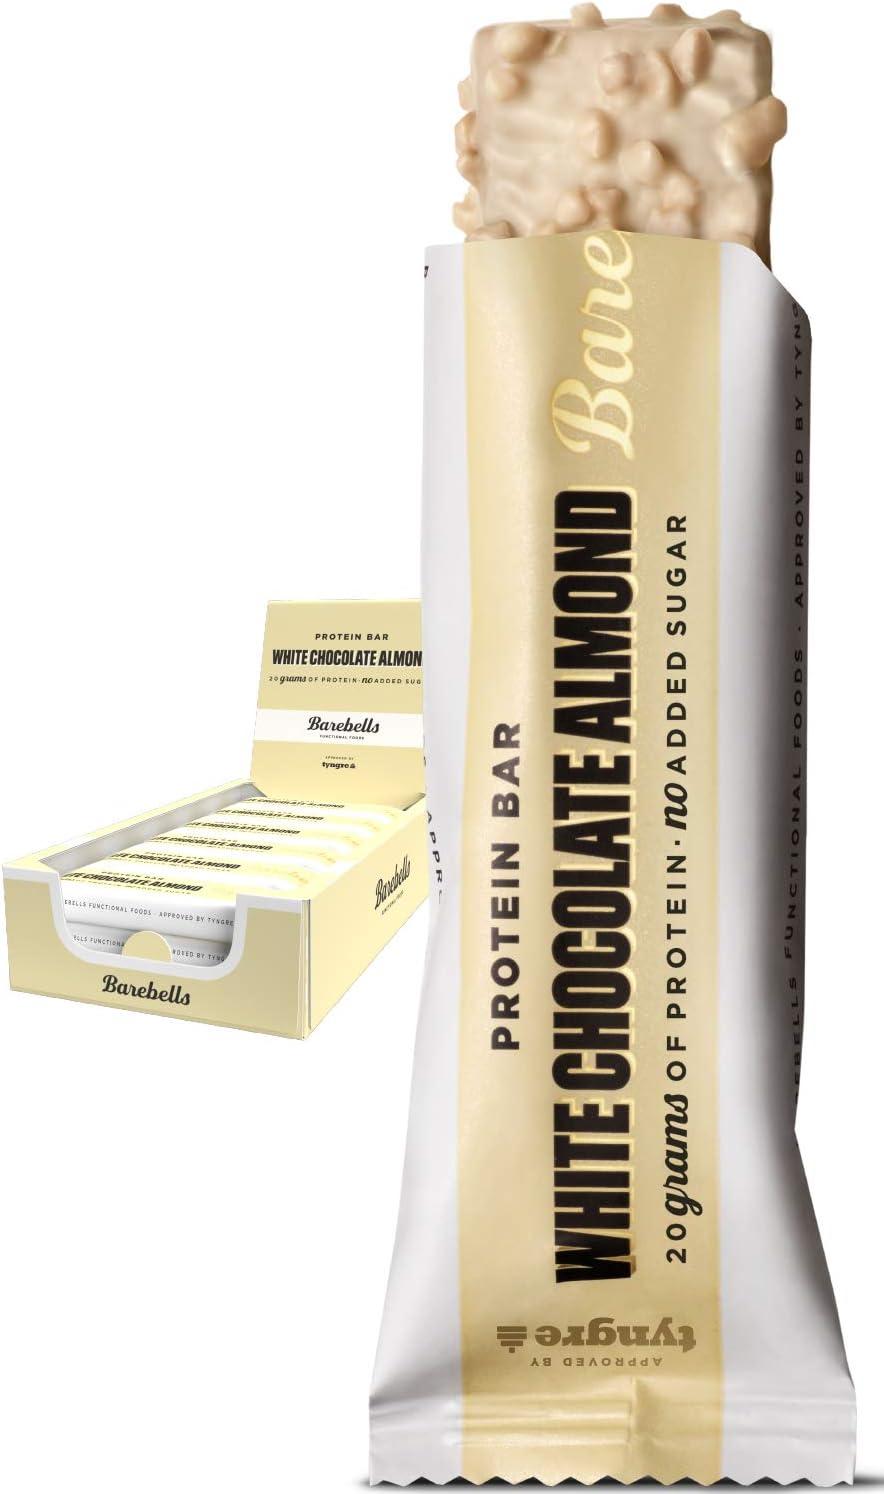 Barritas de Proteínas Barebells White Chocolate Almond (Sabor Chocolate Blanco y Almendras) 12 Barritas x 55g, Rica en Proteínas, Bajo en ...